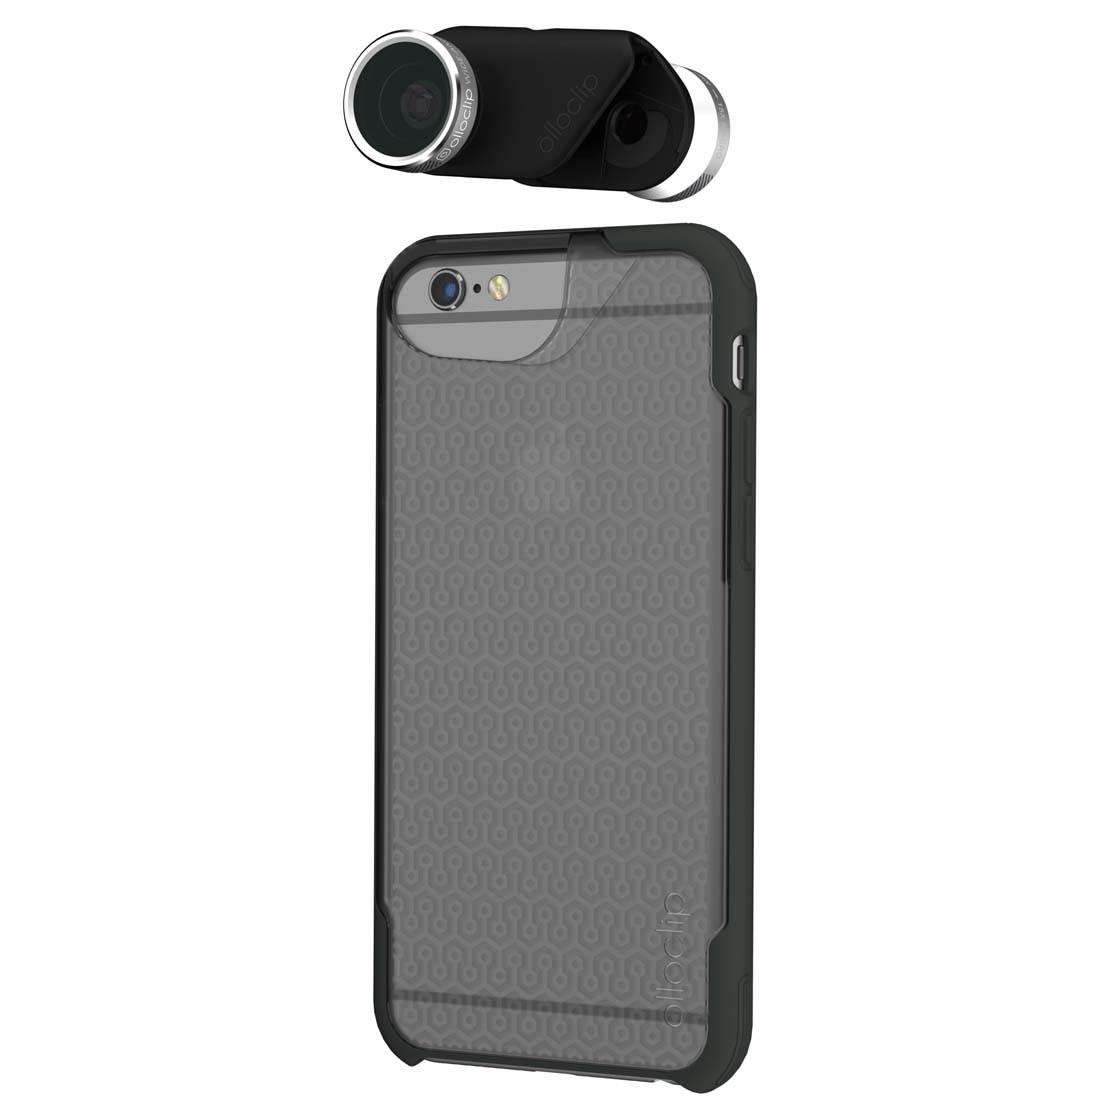 iPhone Ollocase Olloclip Active Lens 24 no script